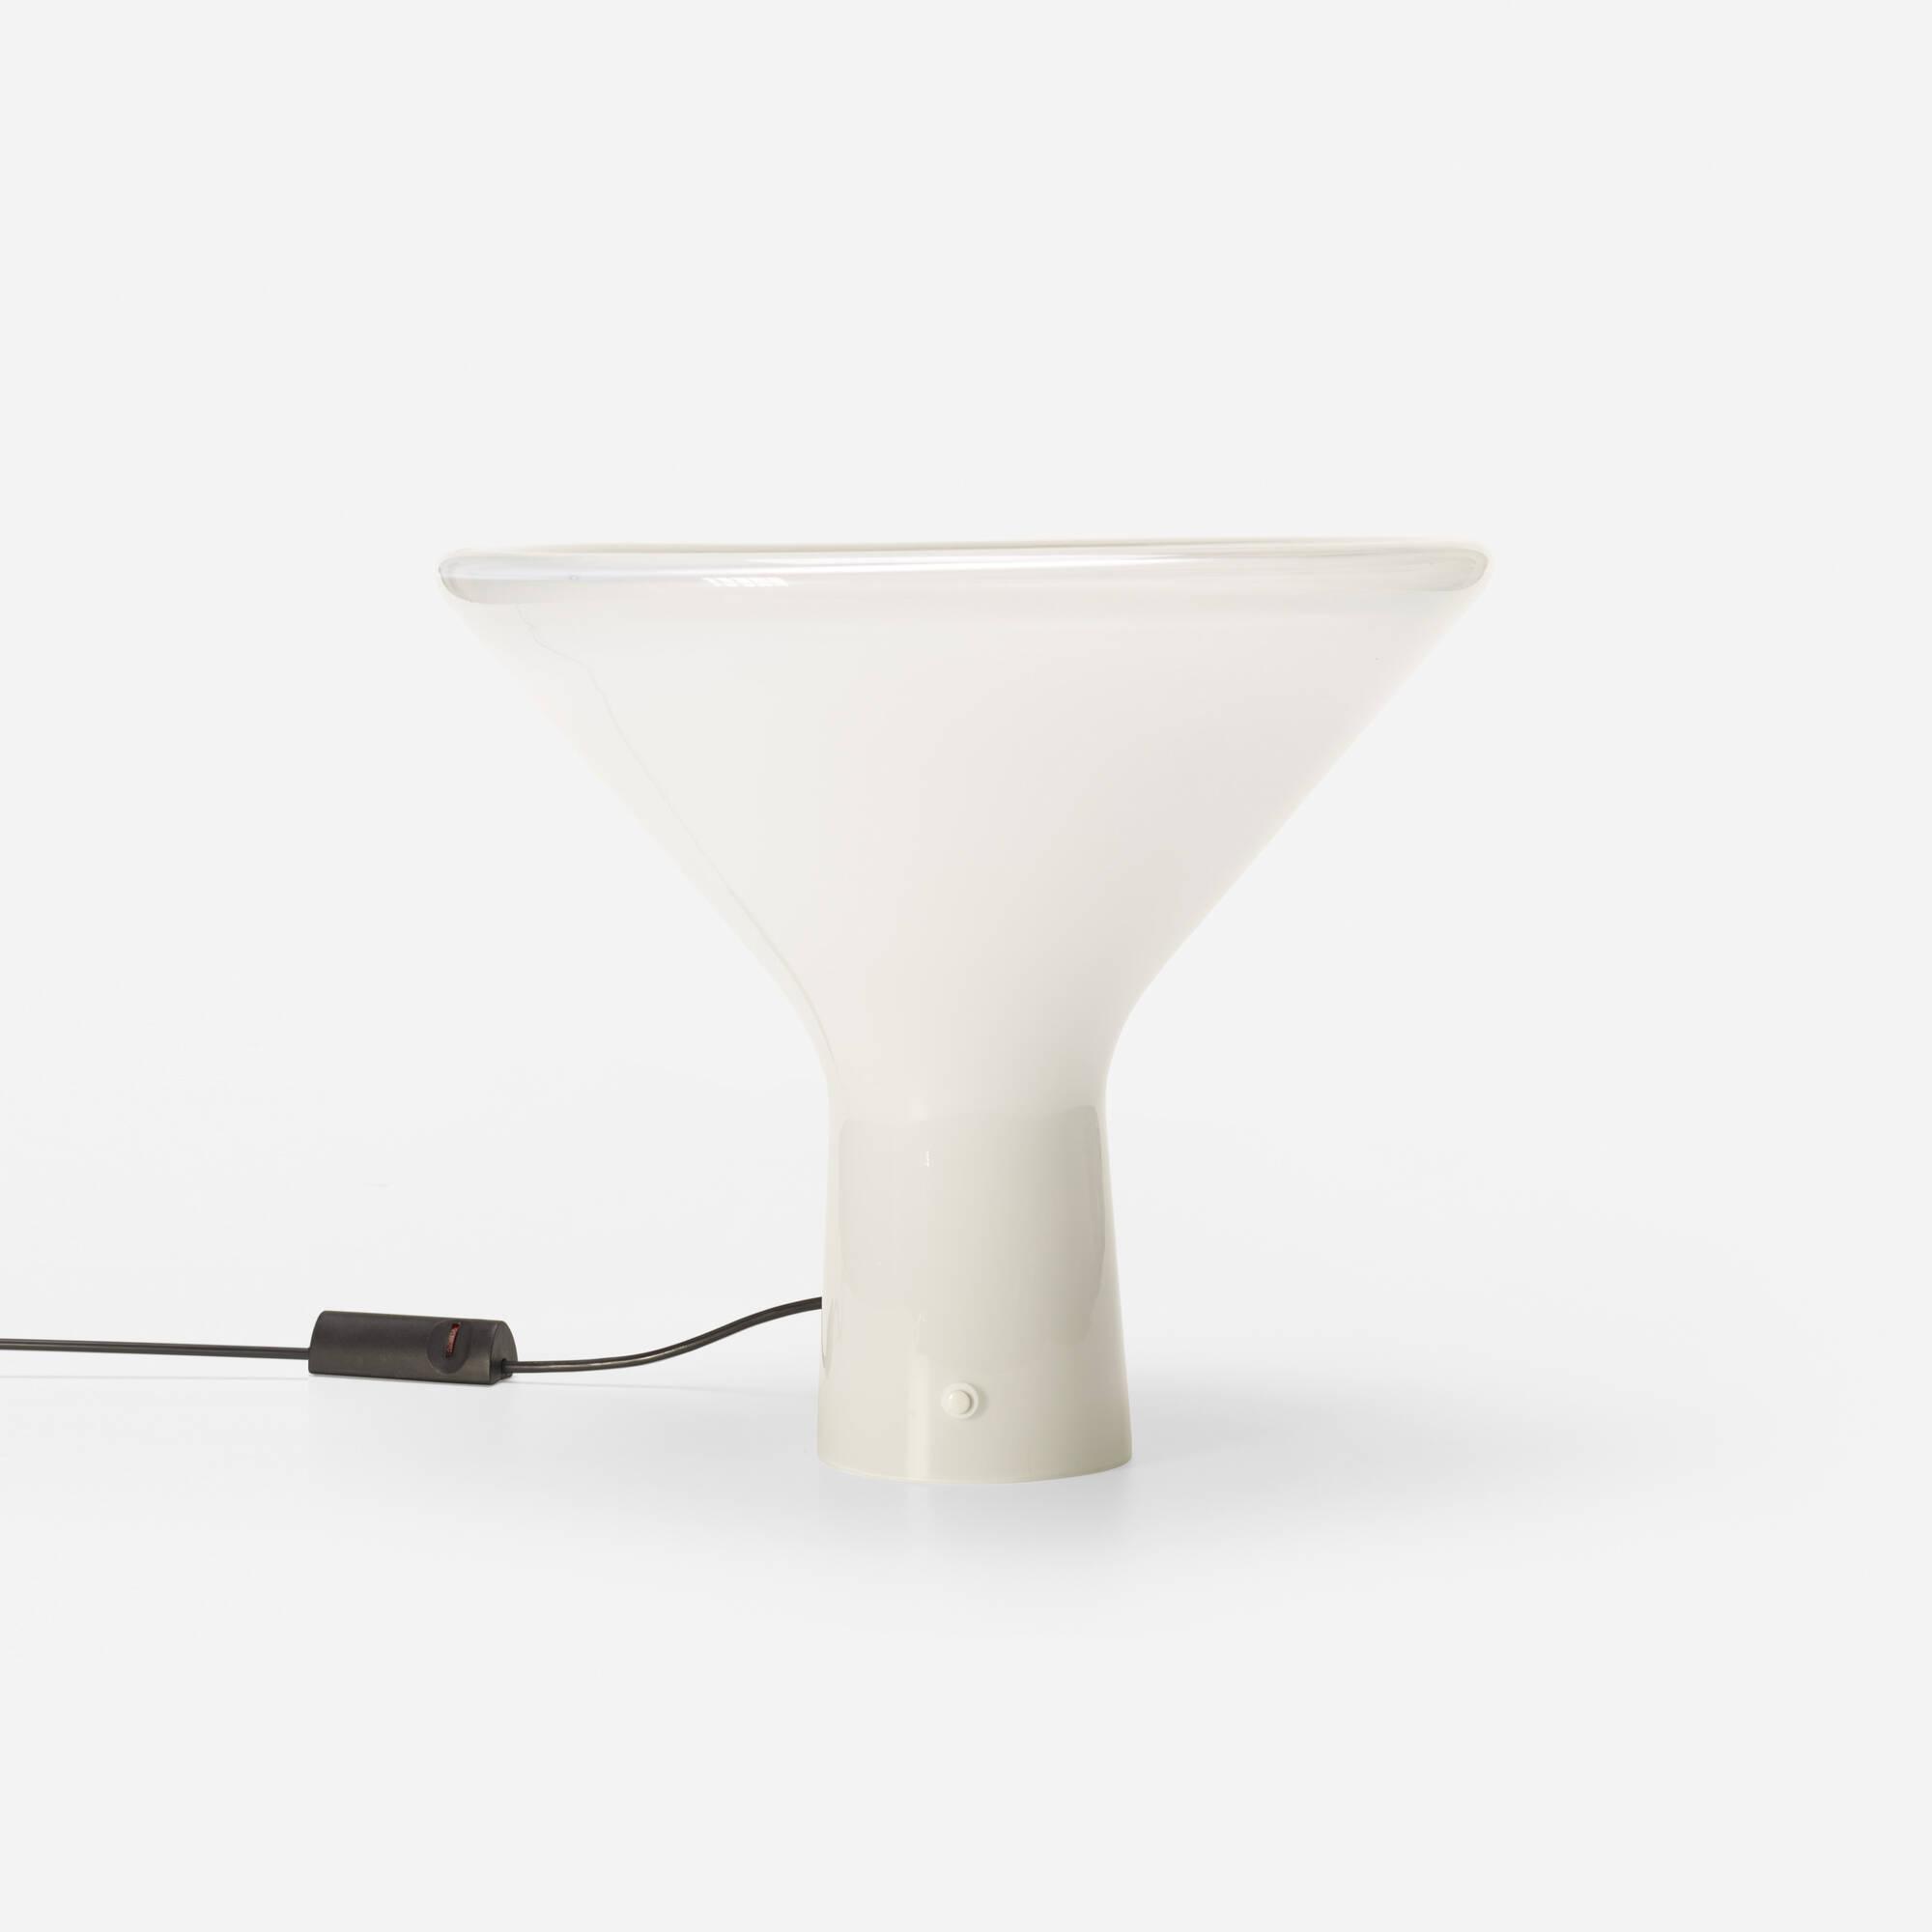 524: Angelo Mangiarotti / table lamp (1 of 2)